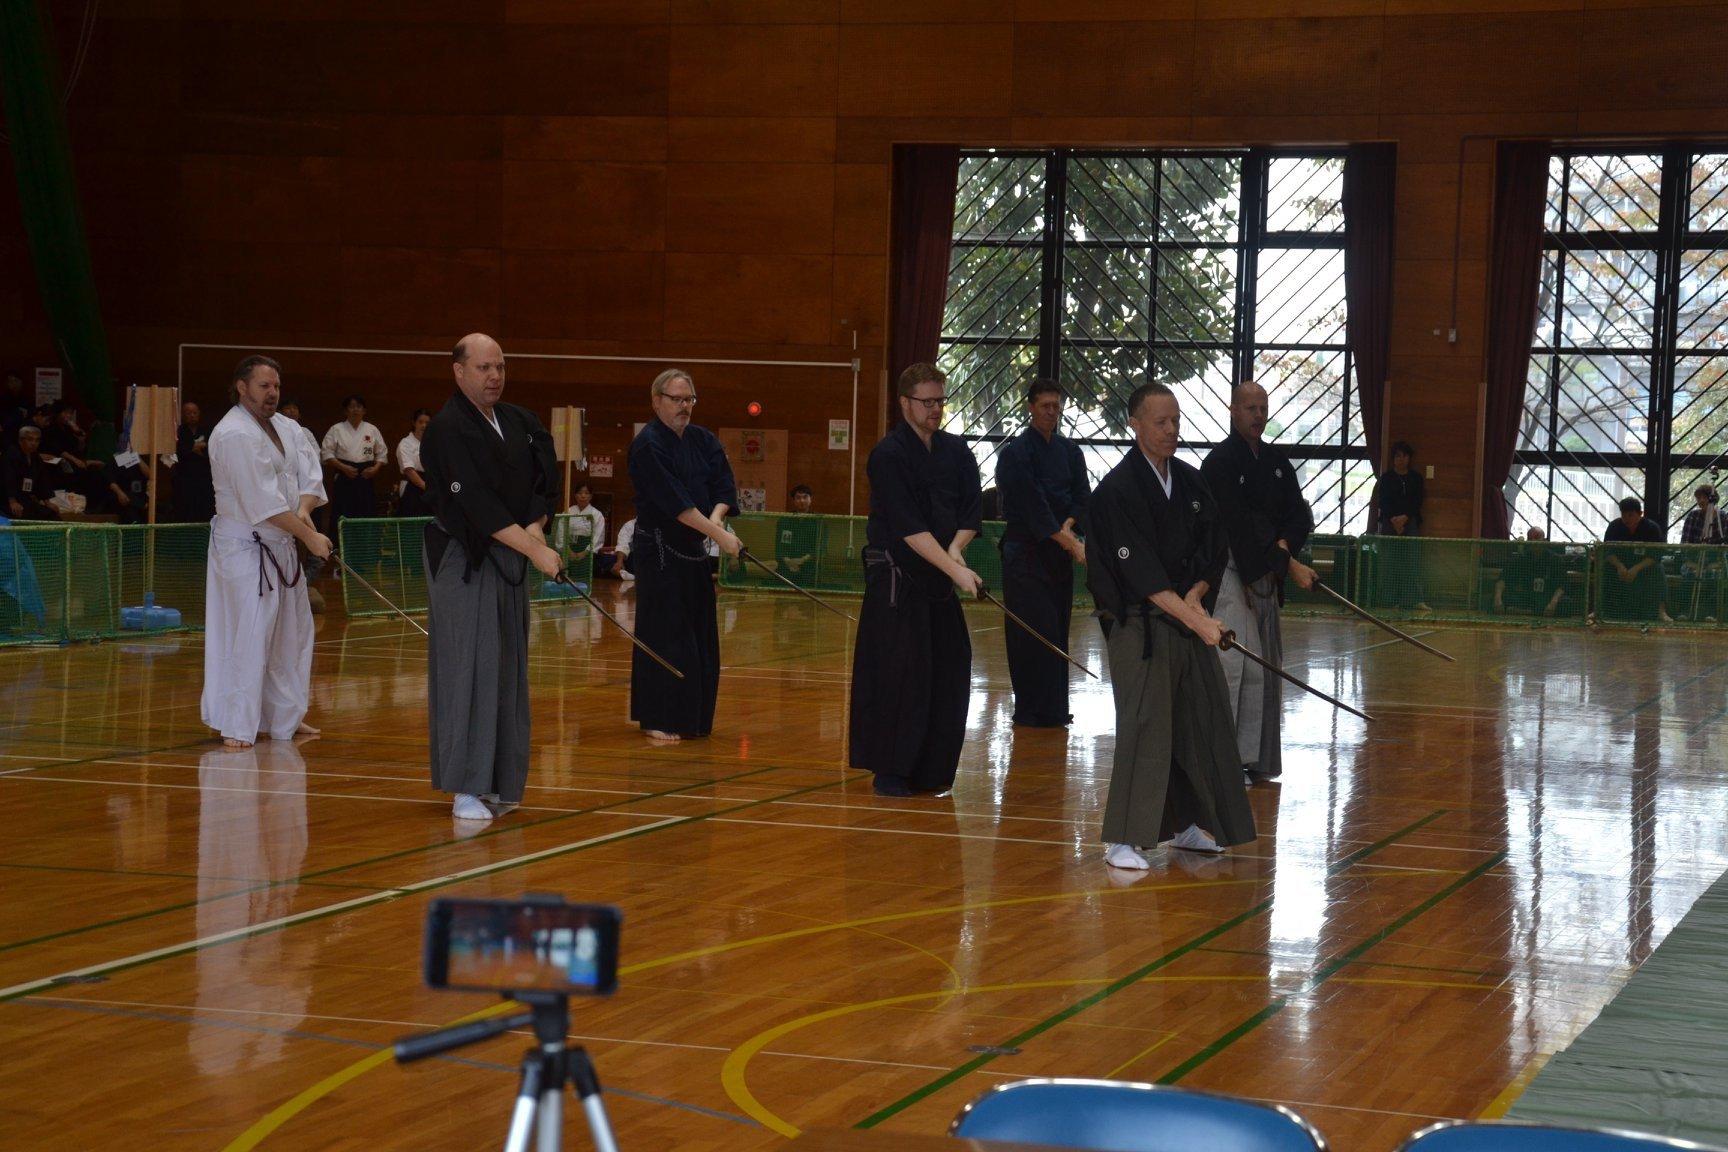 Toyama Ryu Embu - participants from UK, Canada, Australia, D.C., California and Kenshinkan Dojo.